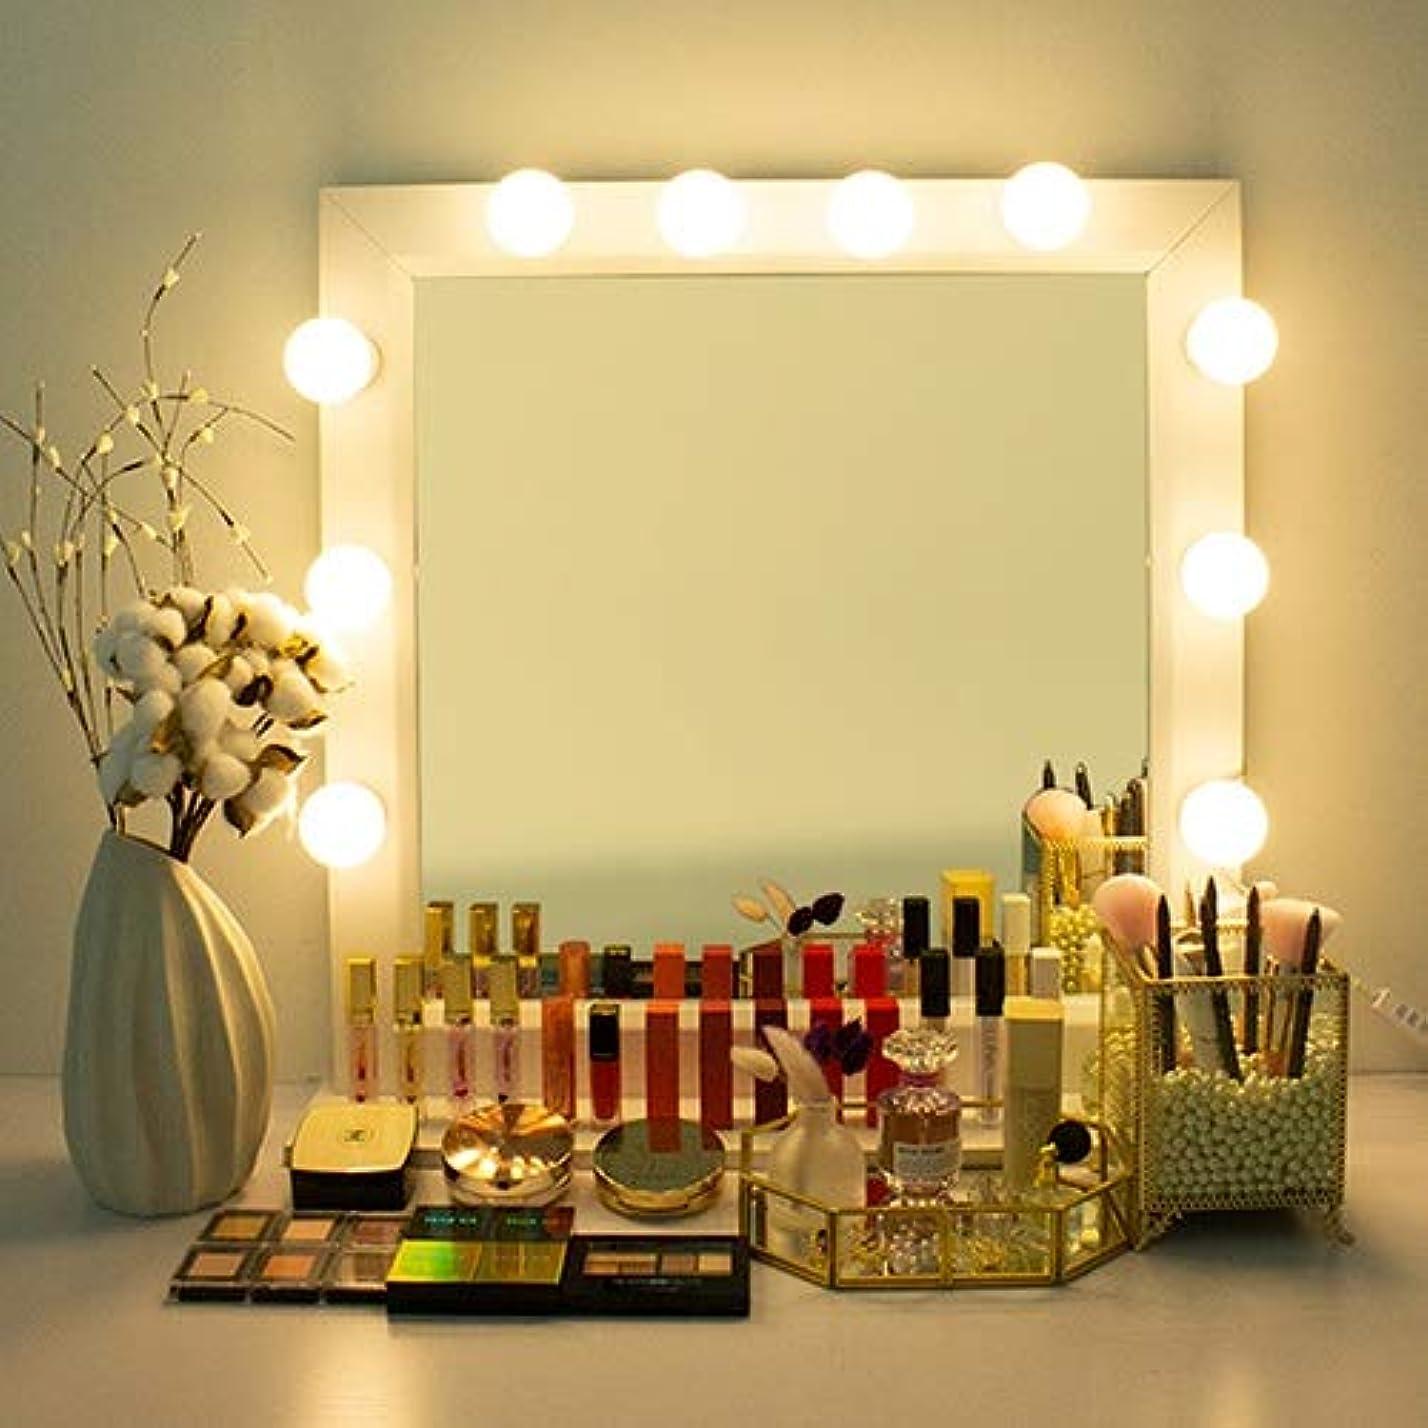 PETIT THINGS LED プチシンスLED女神照明 芸能人化粧台 ハリウッドミラー 化粧鏡